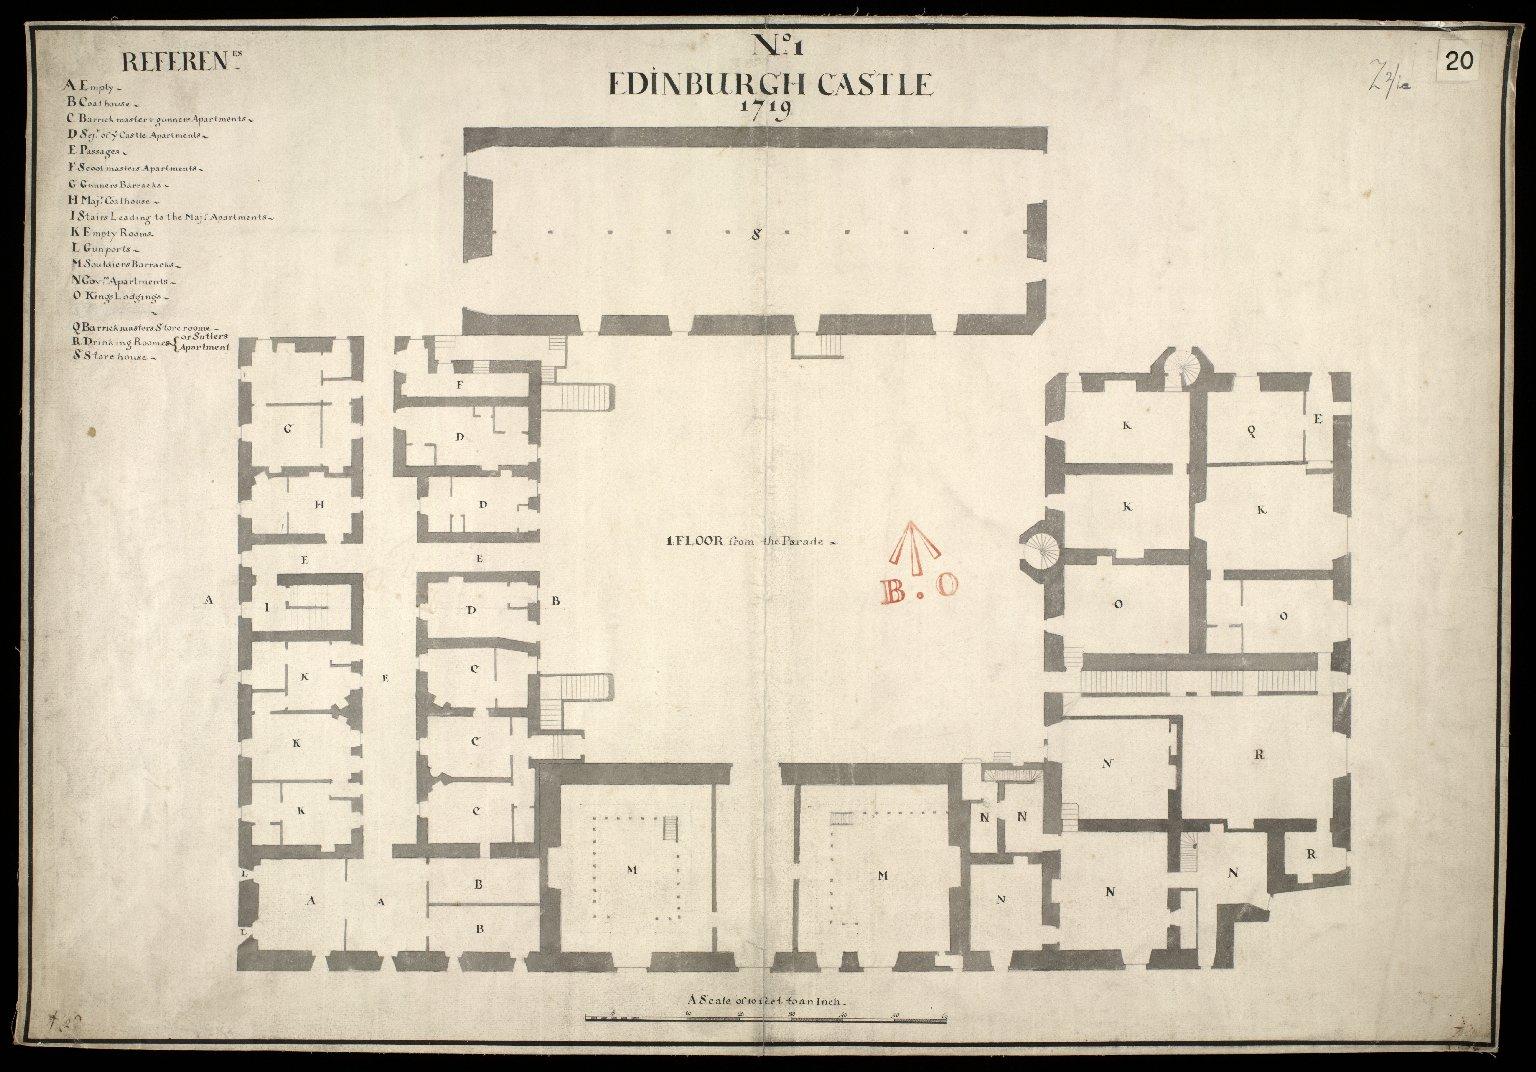 Edinburgh Castle, No. 1, 1719 [1 of 1]